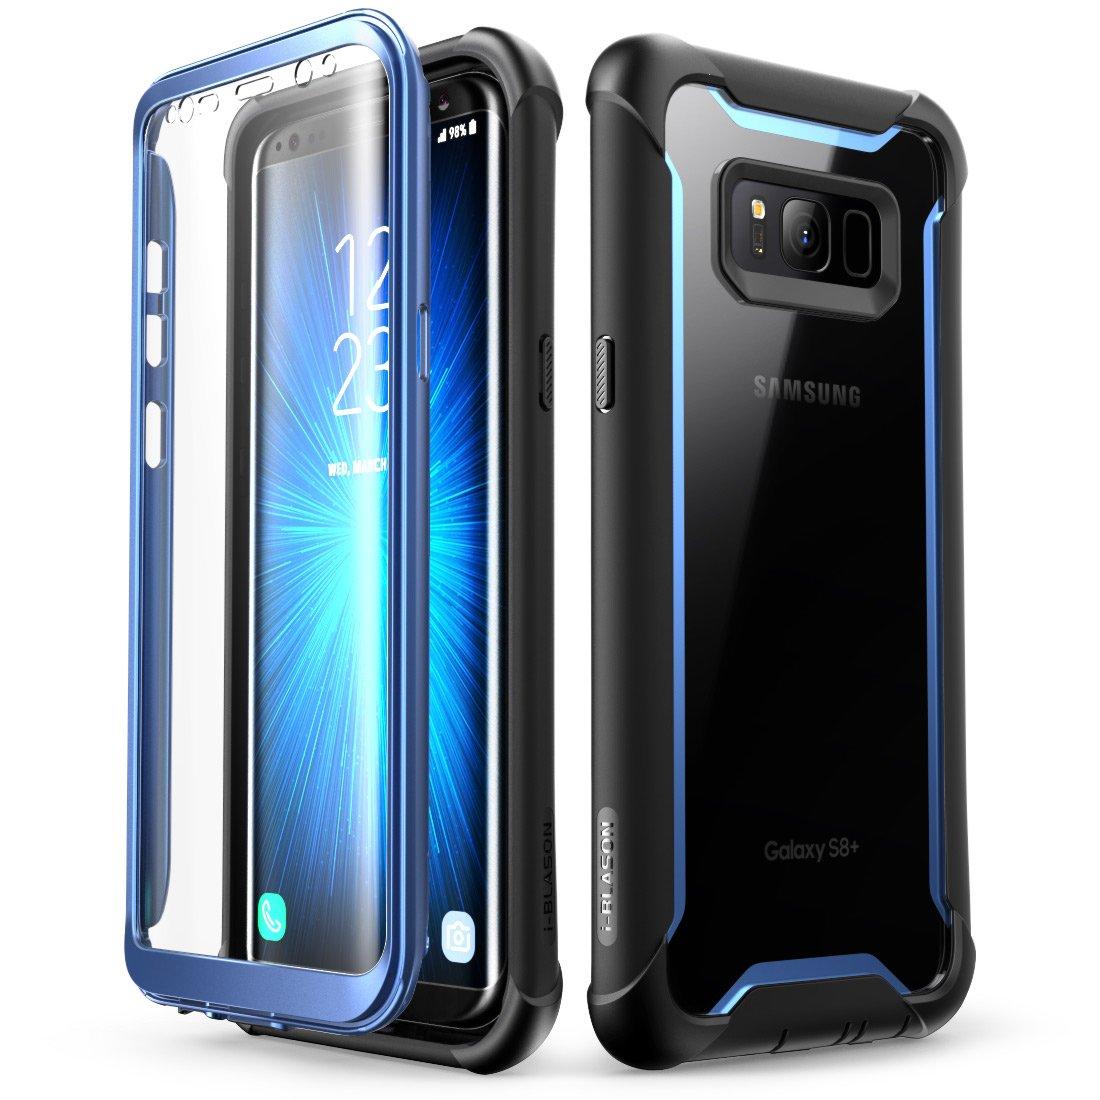 i-Blason Funda Galaxy S8 Plus [Ares] Transparente Case Carcasa ...